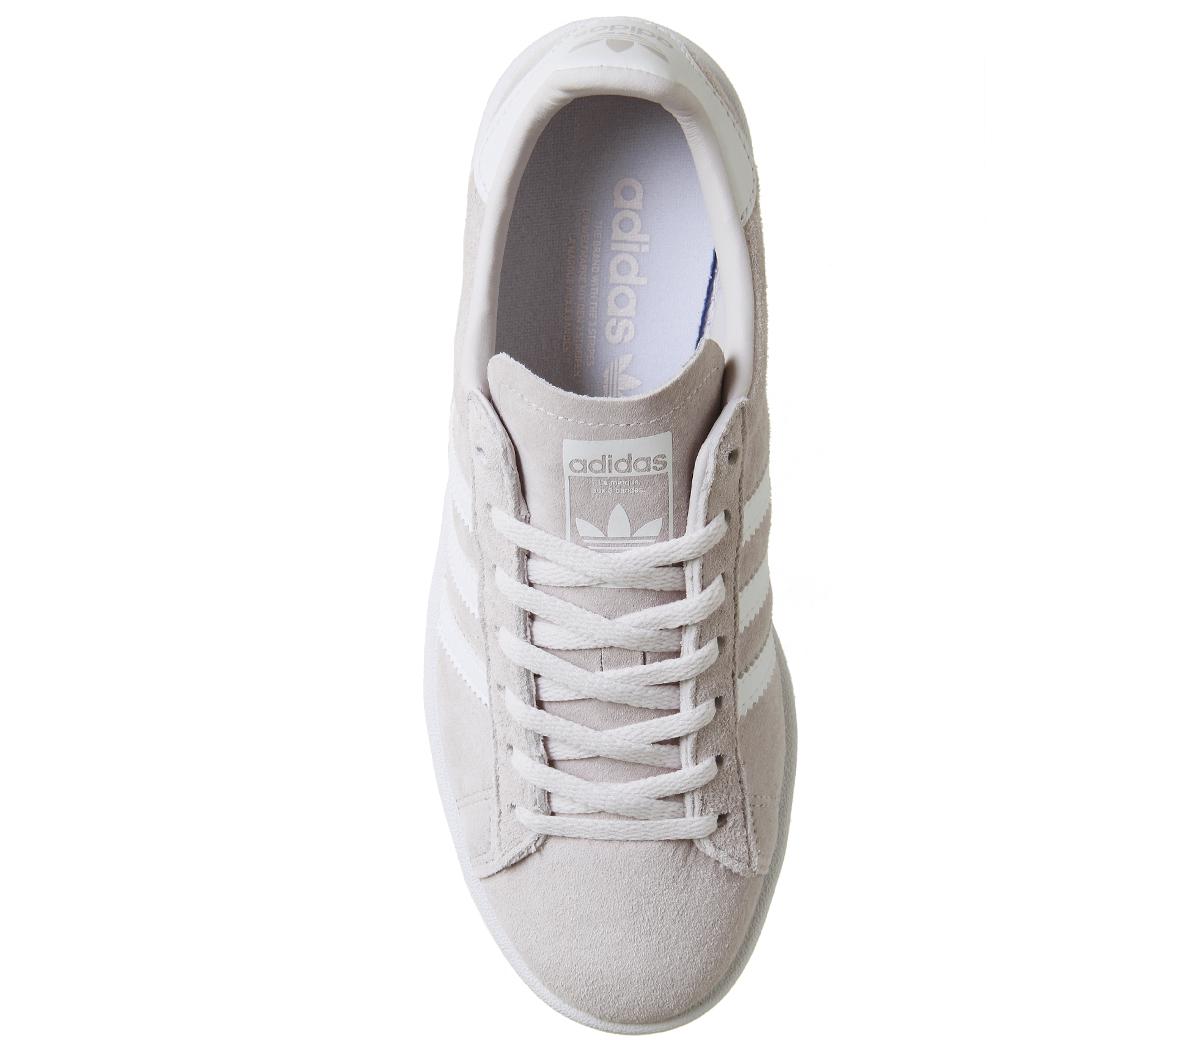 online retailer 89735 97997 ... Le donne campus dei formatori formatori scarpe adidas campus donne  orchidea tinta 6cf67e ...